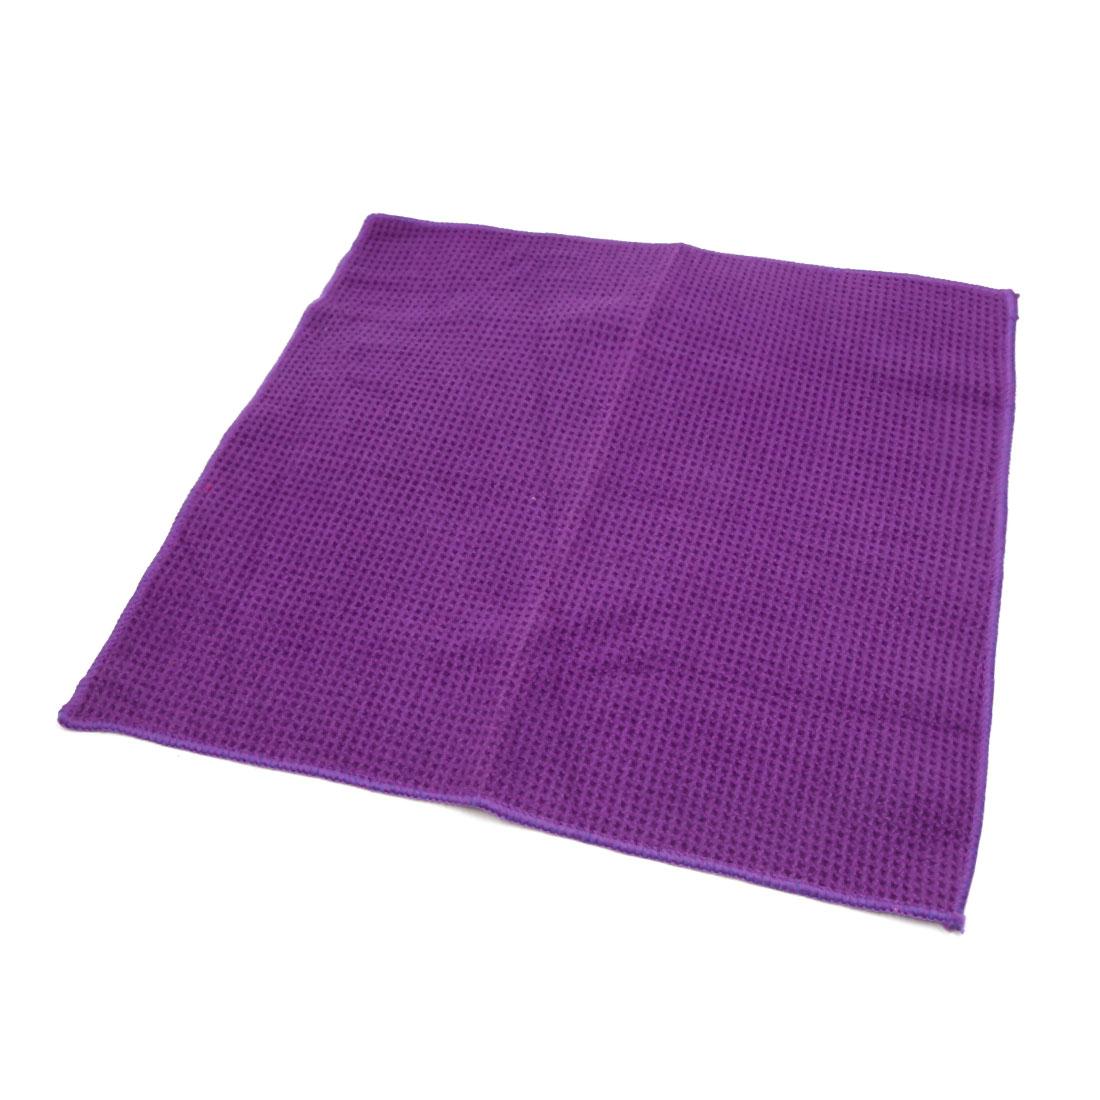 Purple Soft Home Auto Car Care Dry Washing Polishing Duster Cloth Towels